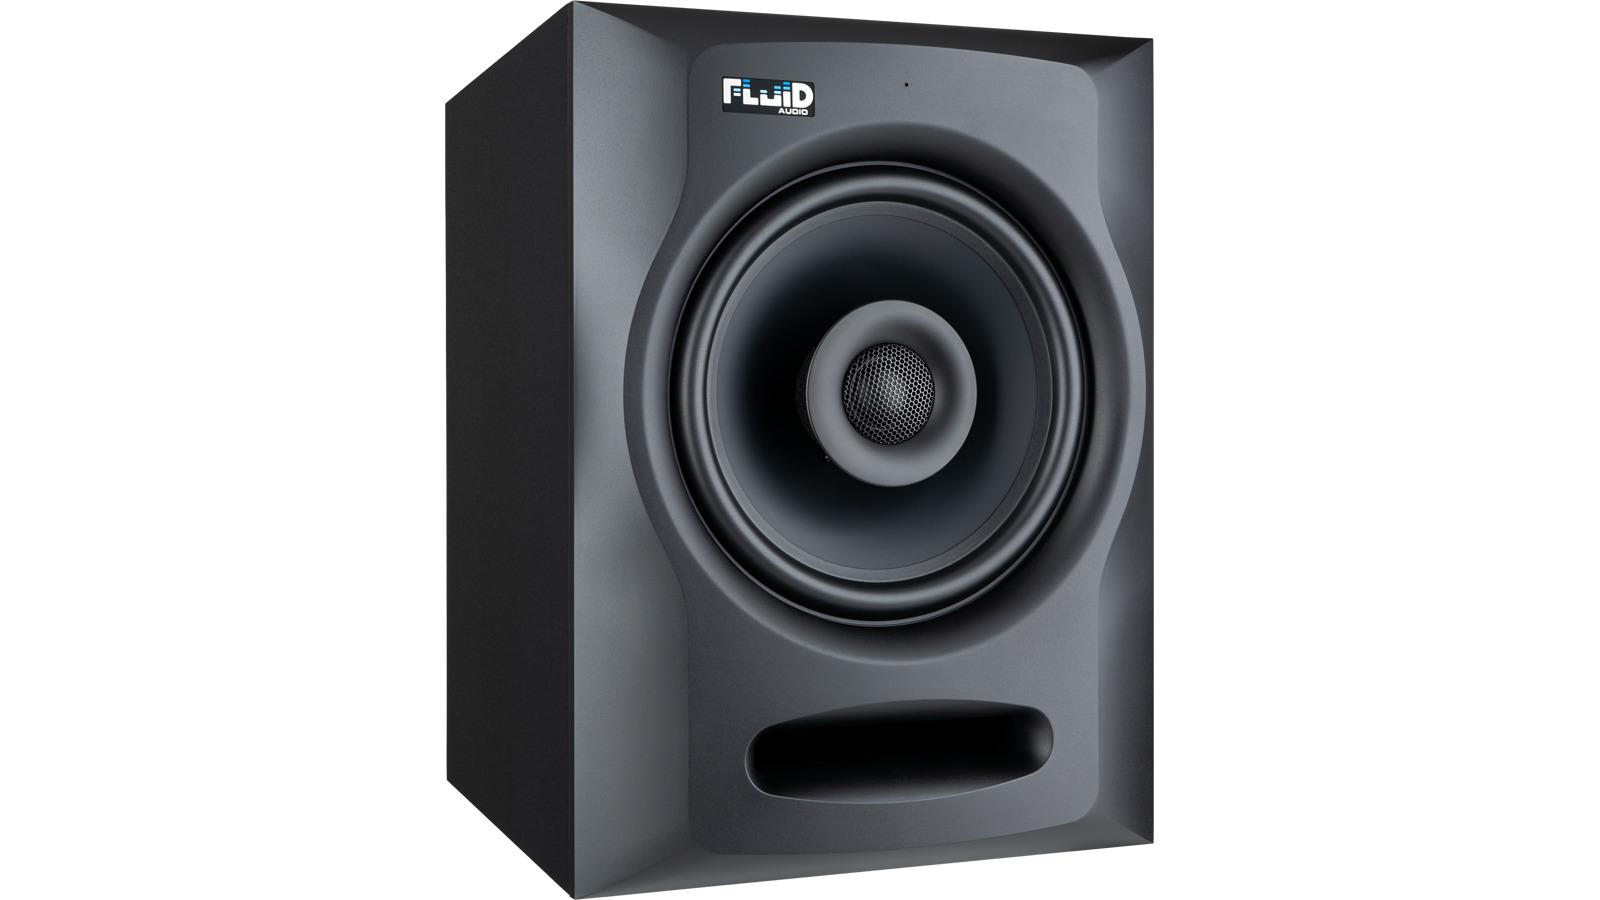 FluidAudio FX50 Studio Monitor aktiv